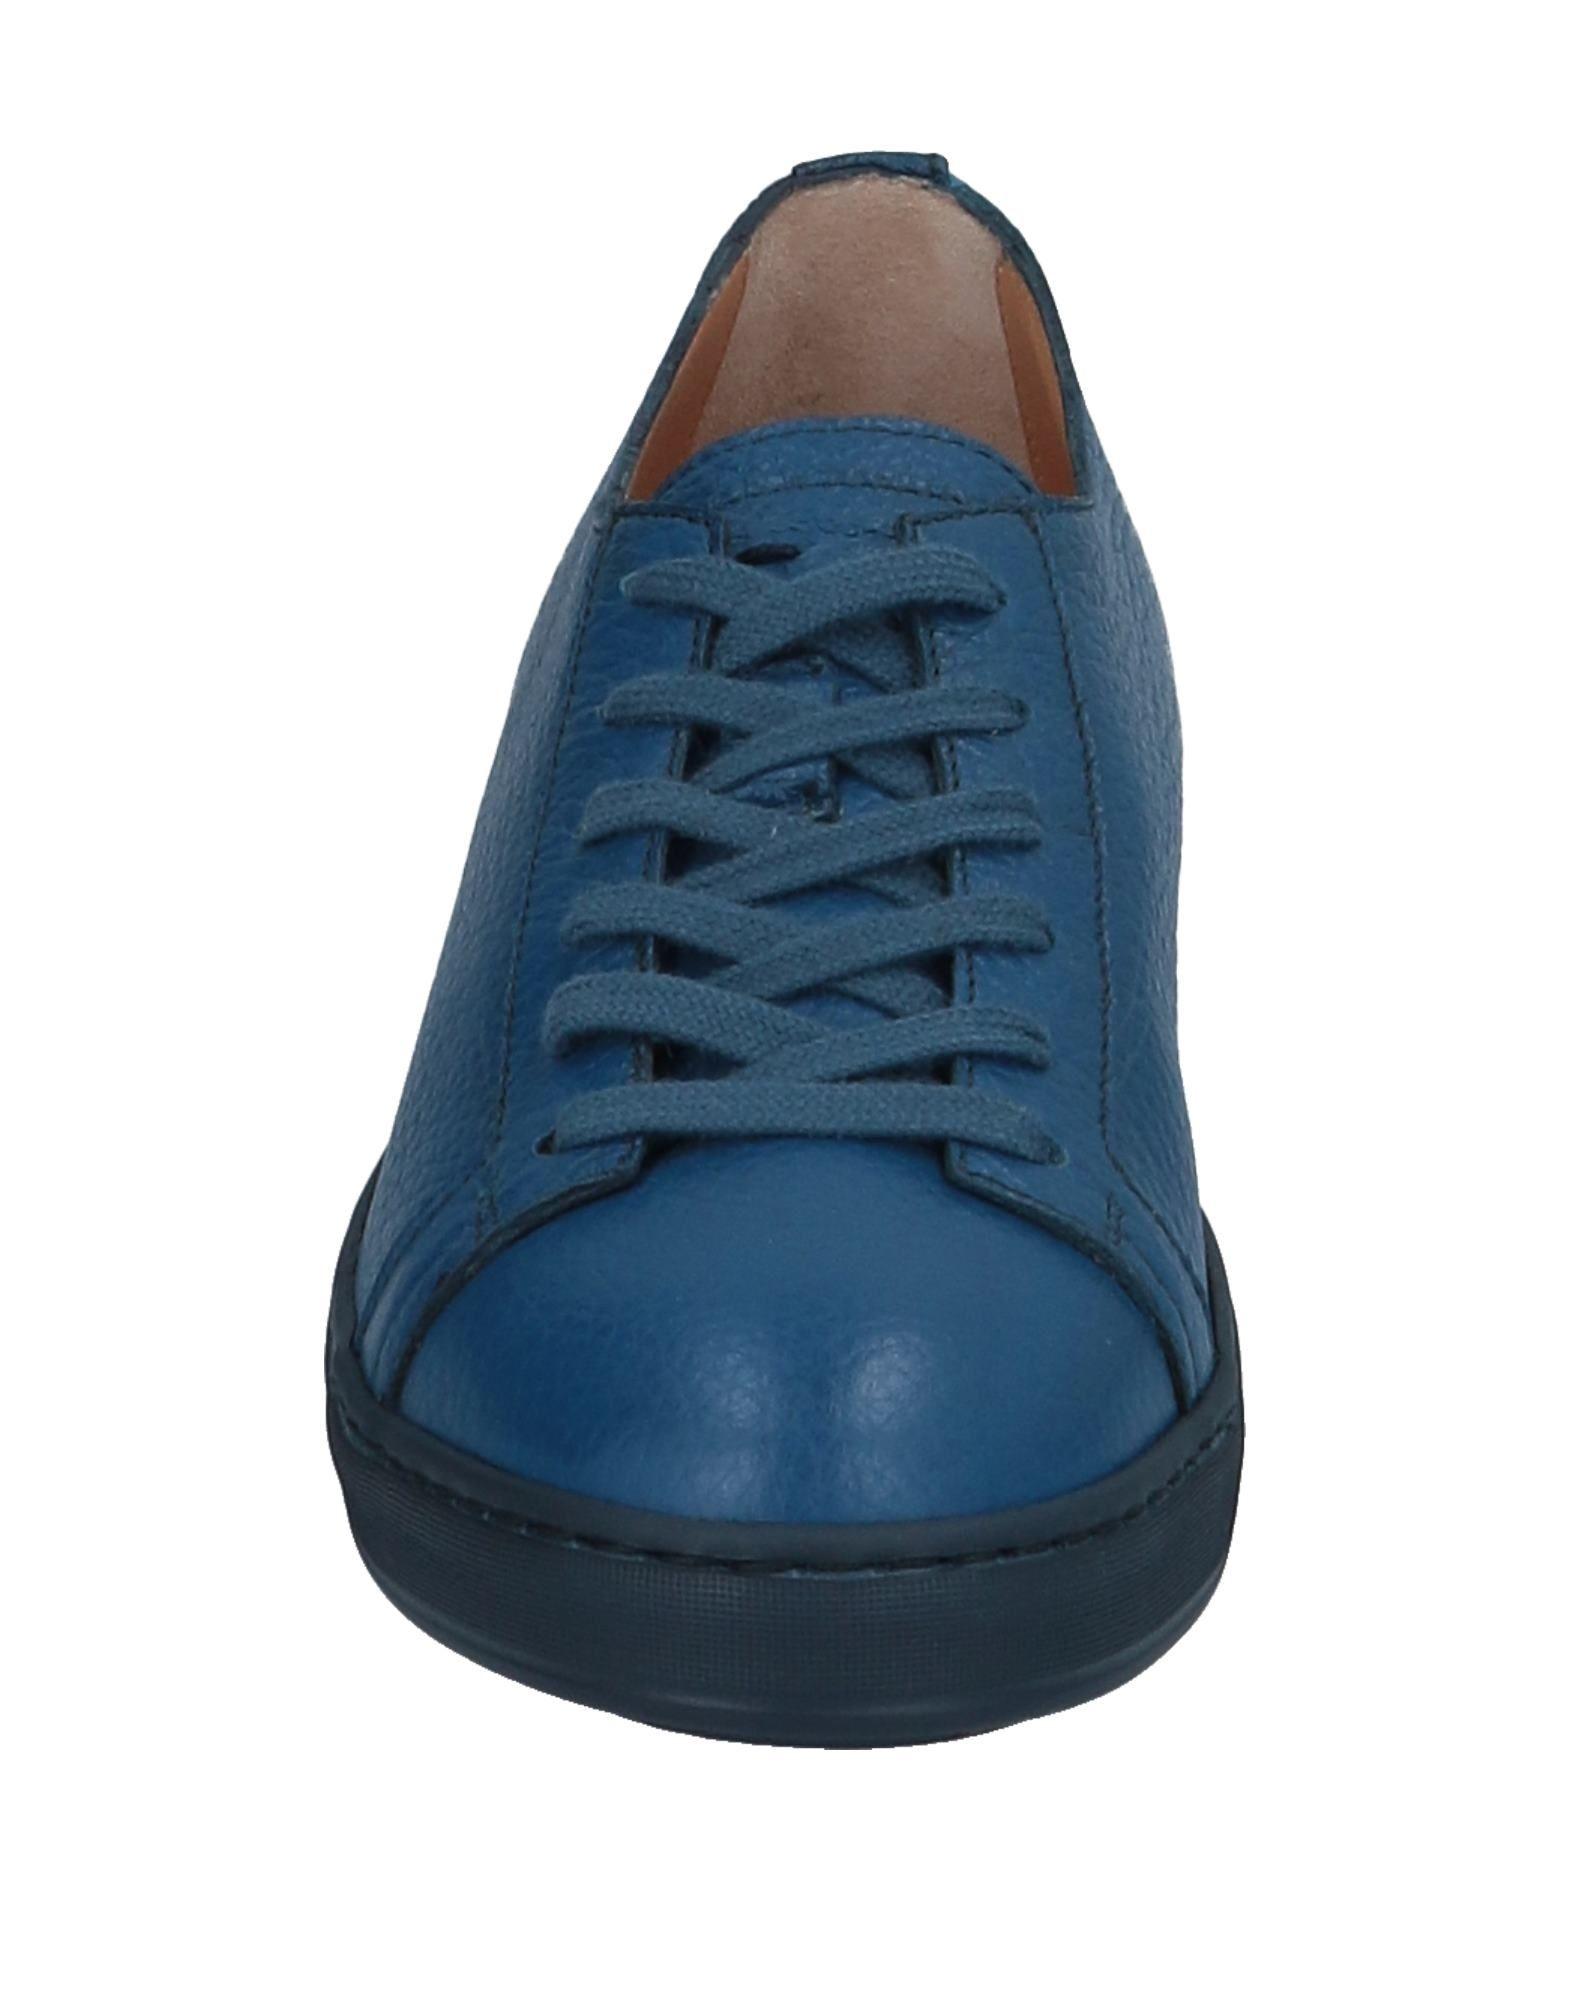 Santoni Damen Sneakers Damen Santoni  11543350AU Heiße Schuhe 15558b